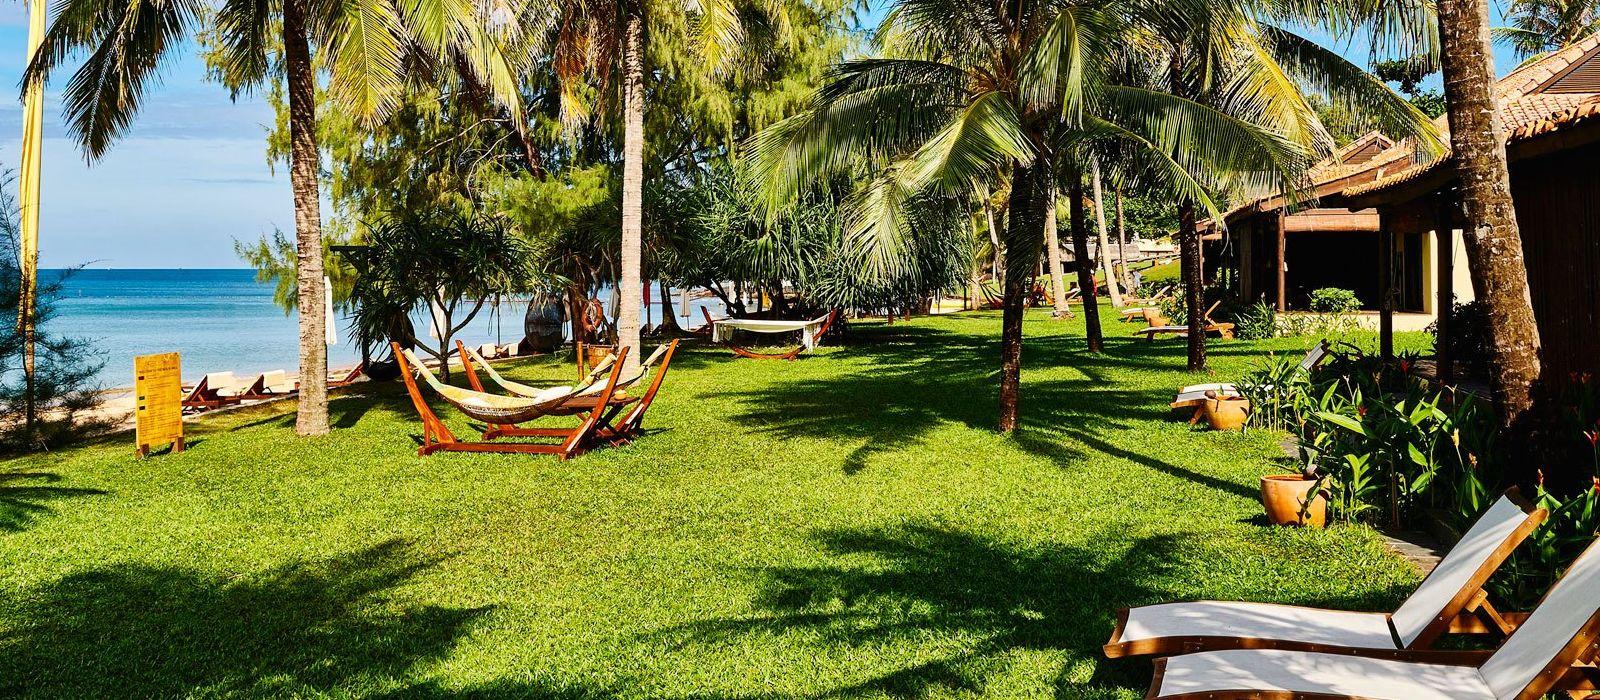 Hotel Chen Sea Resort and Spa (Phu Quoc Island) Vietnam